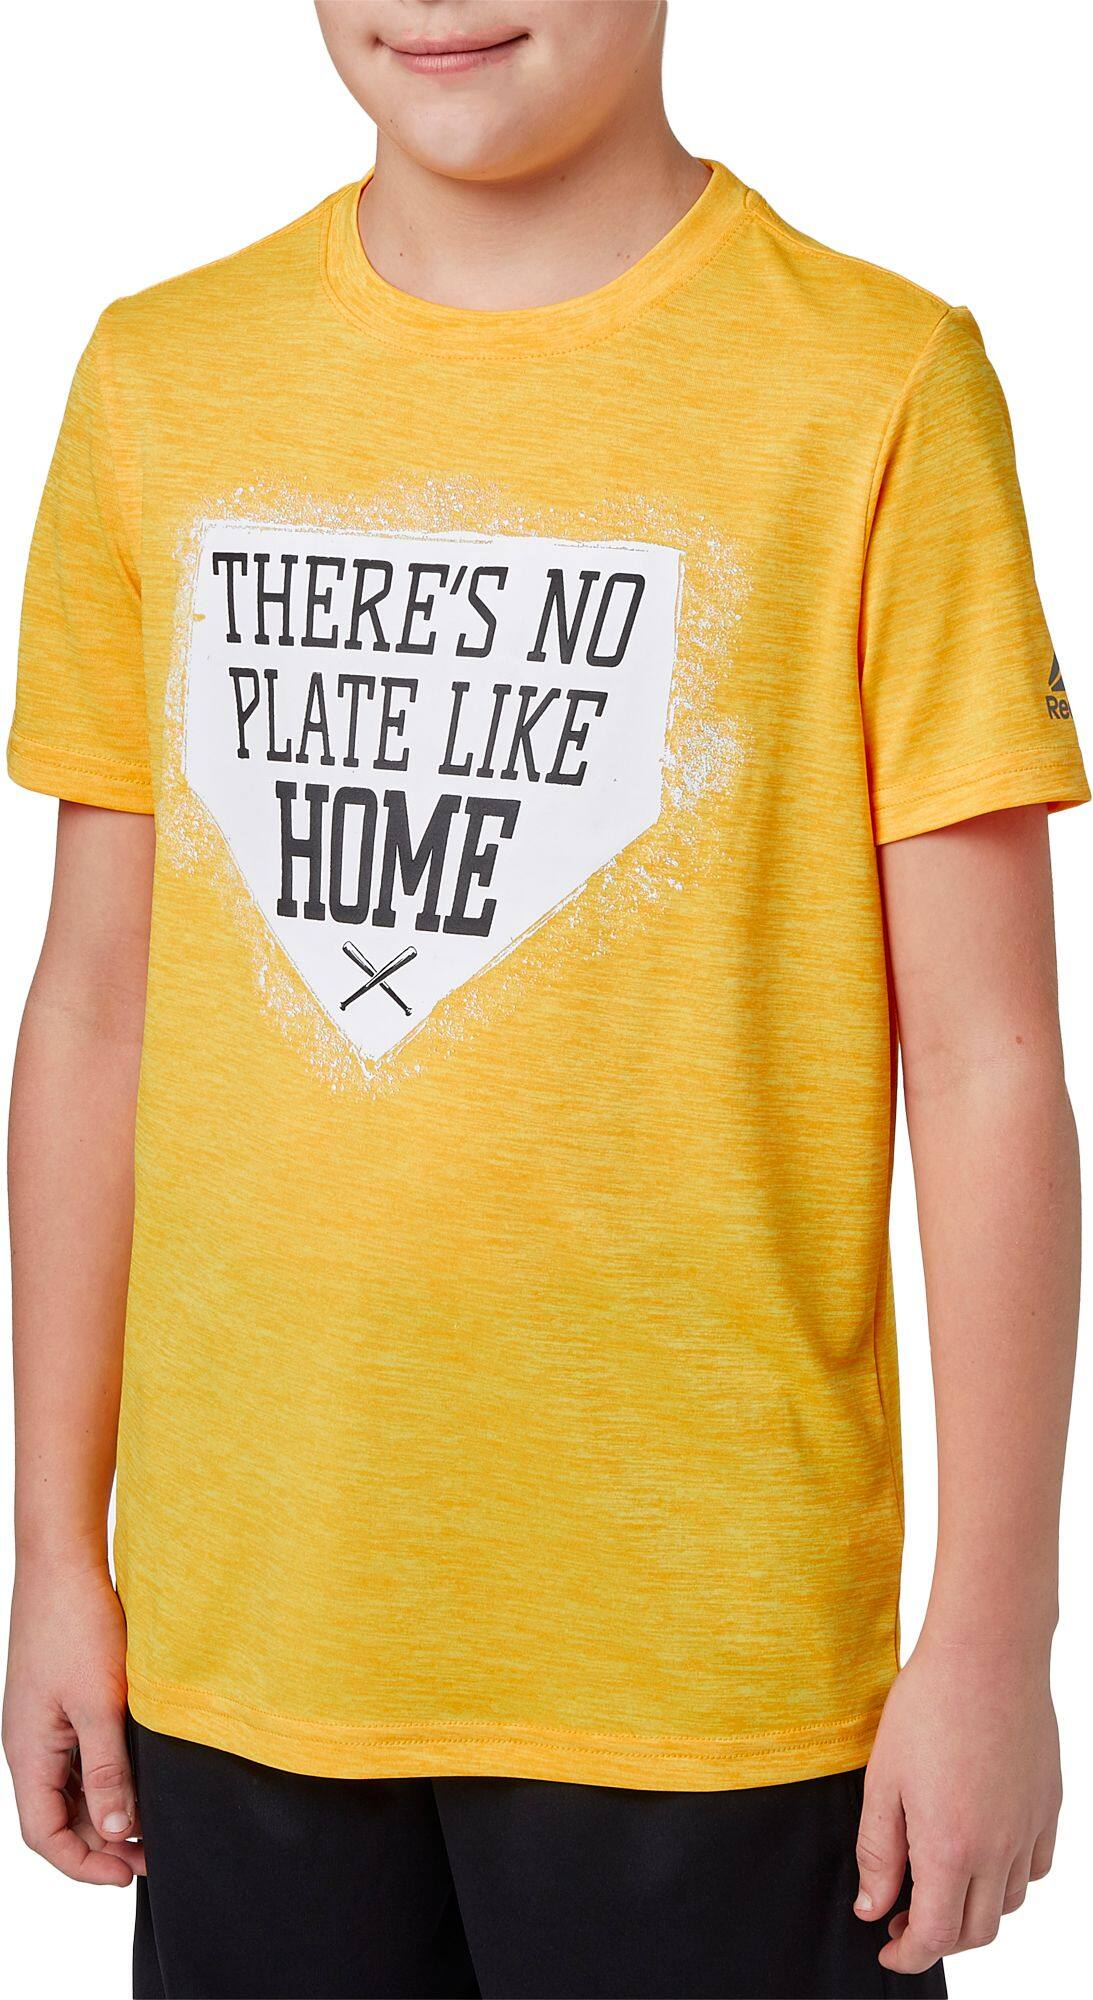 Reebok Boys' Performance Graphic T-Shirt - Dicks Sporting Goods - BOGO: 2 shirts for $6 - Instore Pickup $3